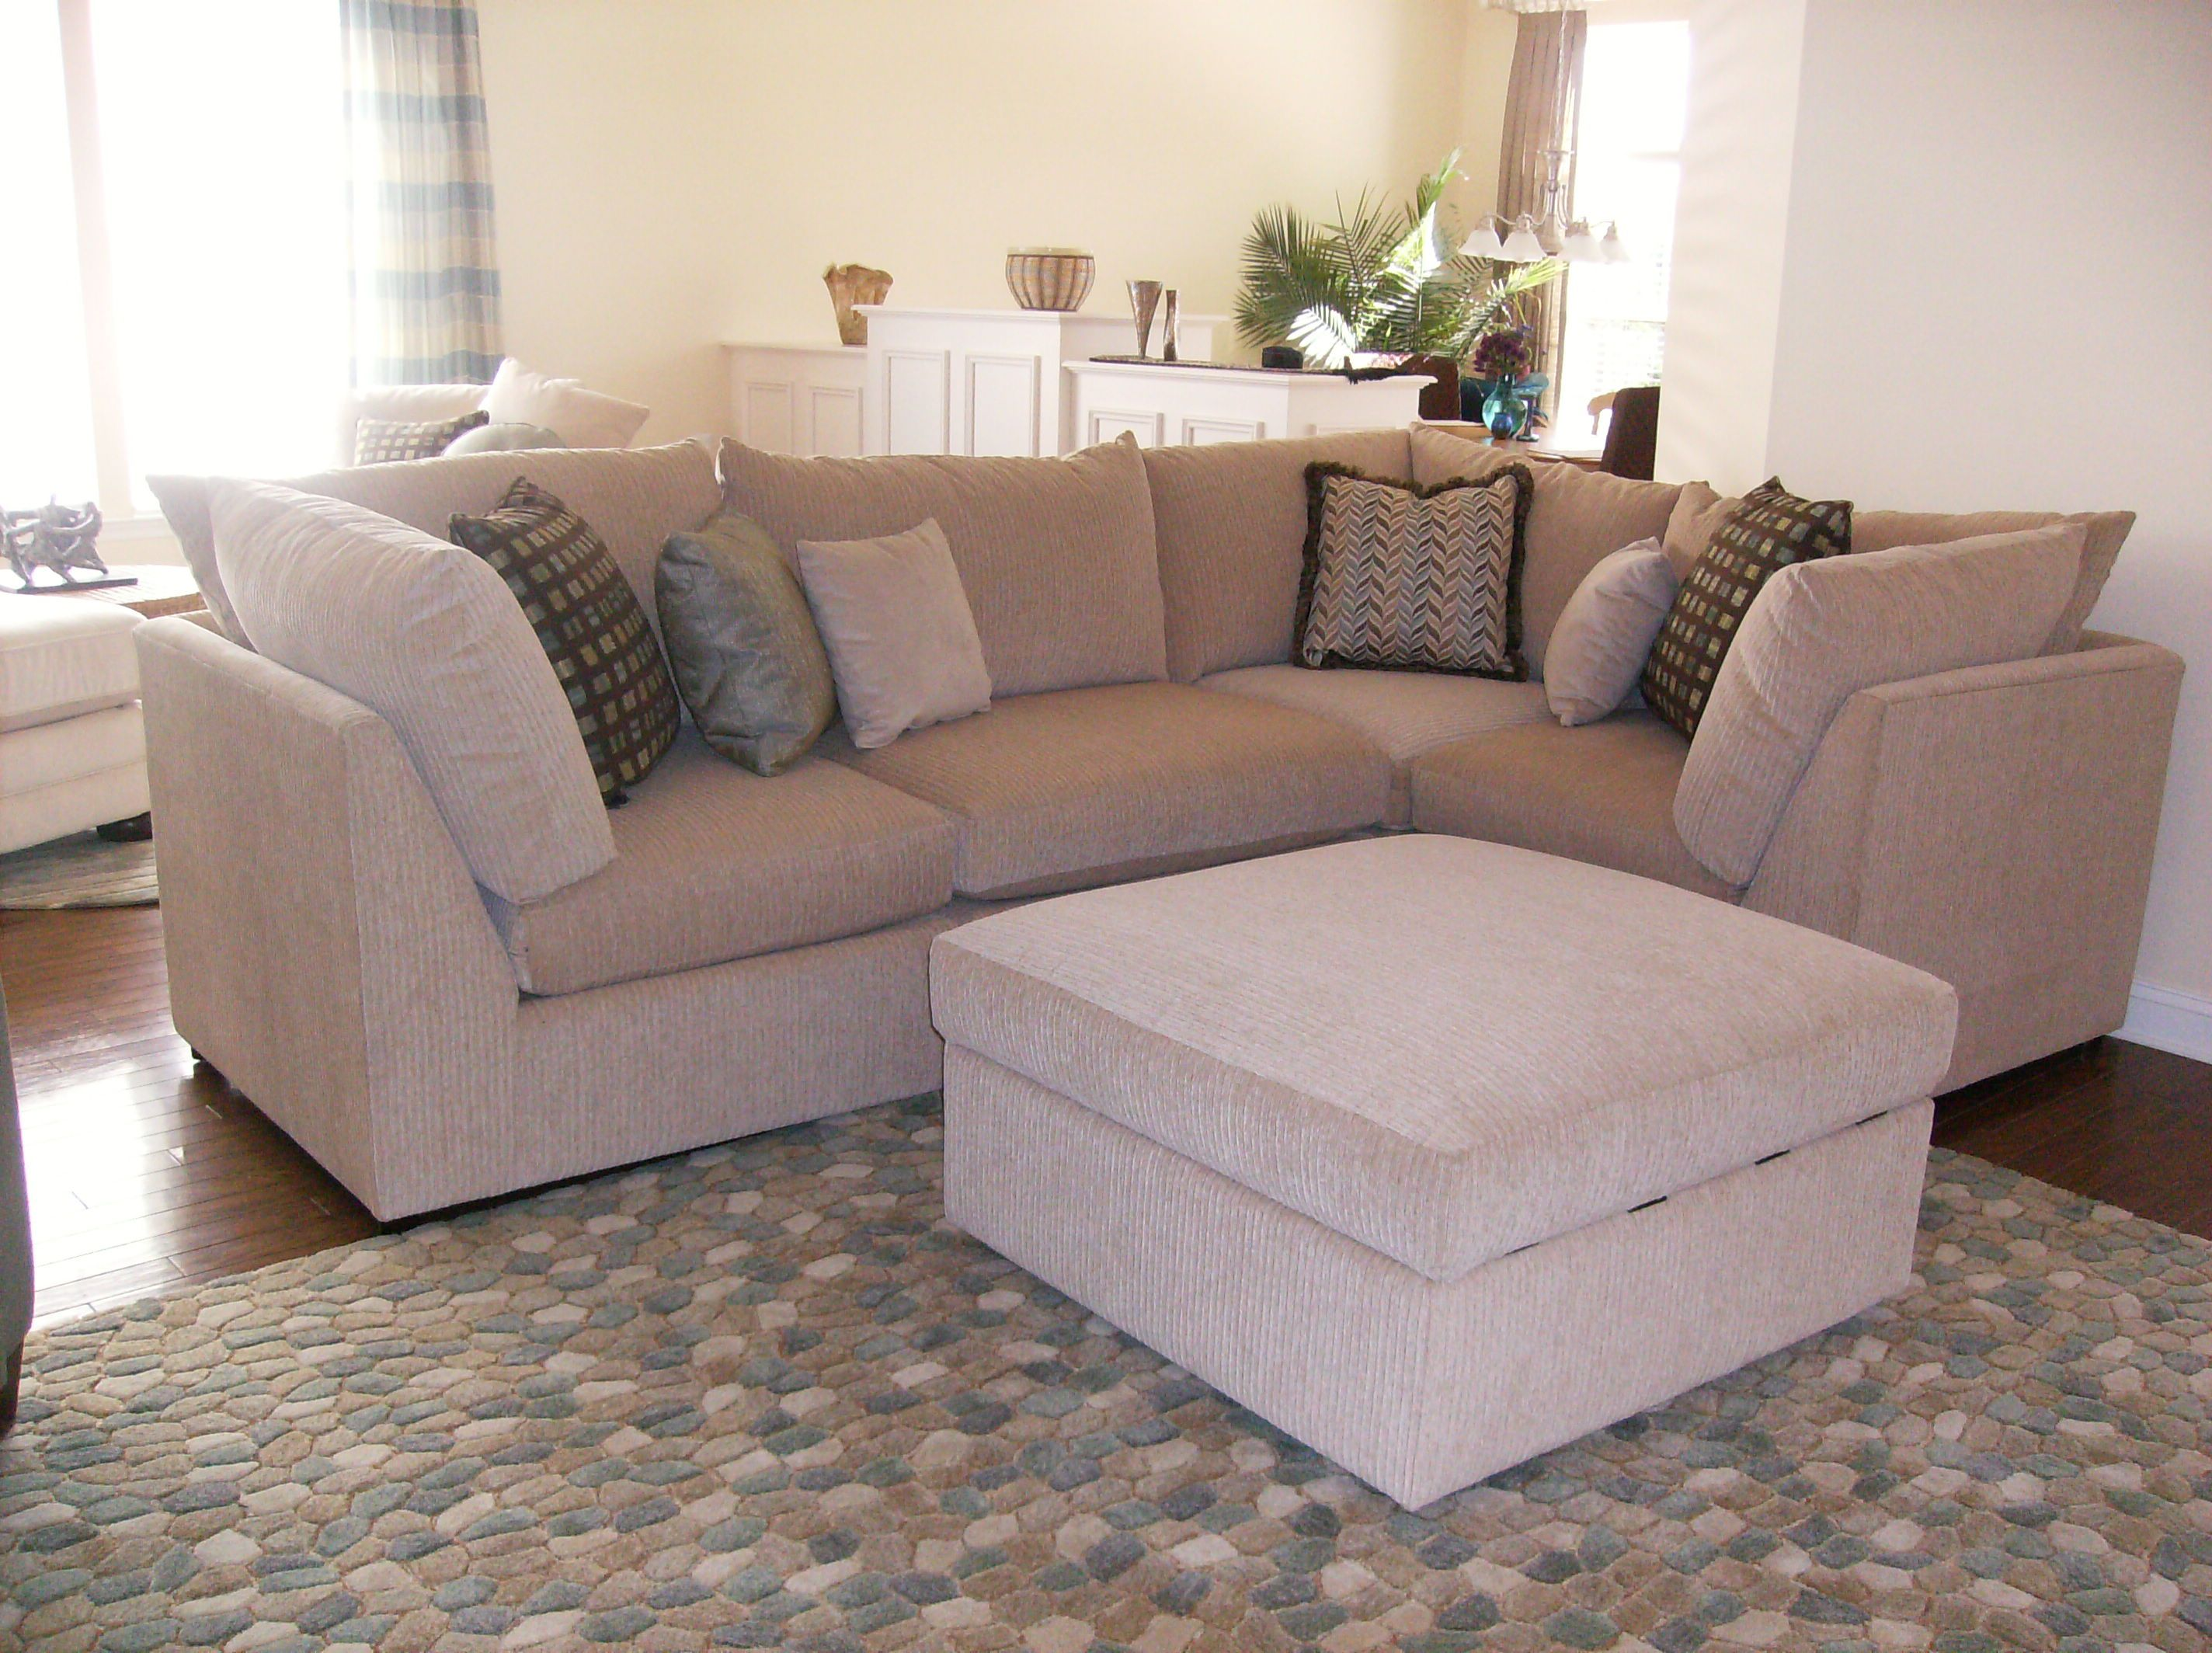 Re Create This Look At Bassett Furniture In Brick, NJ!